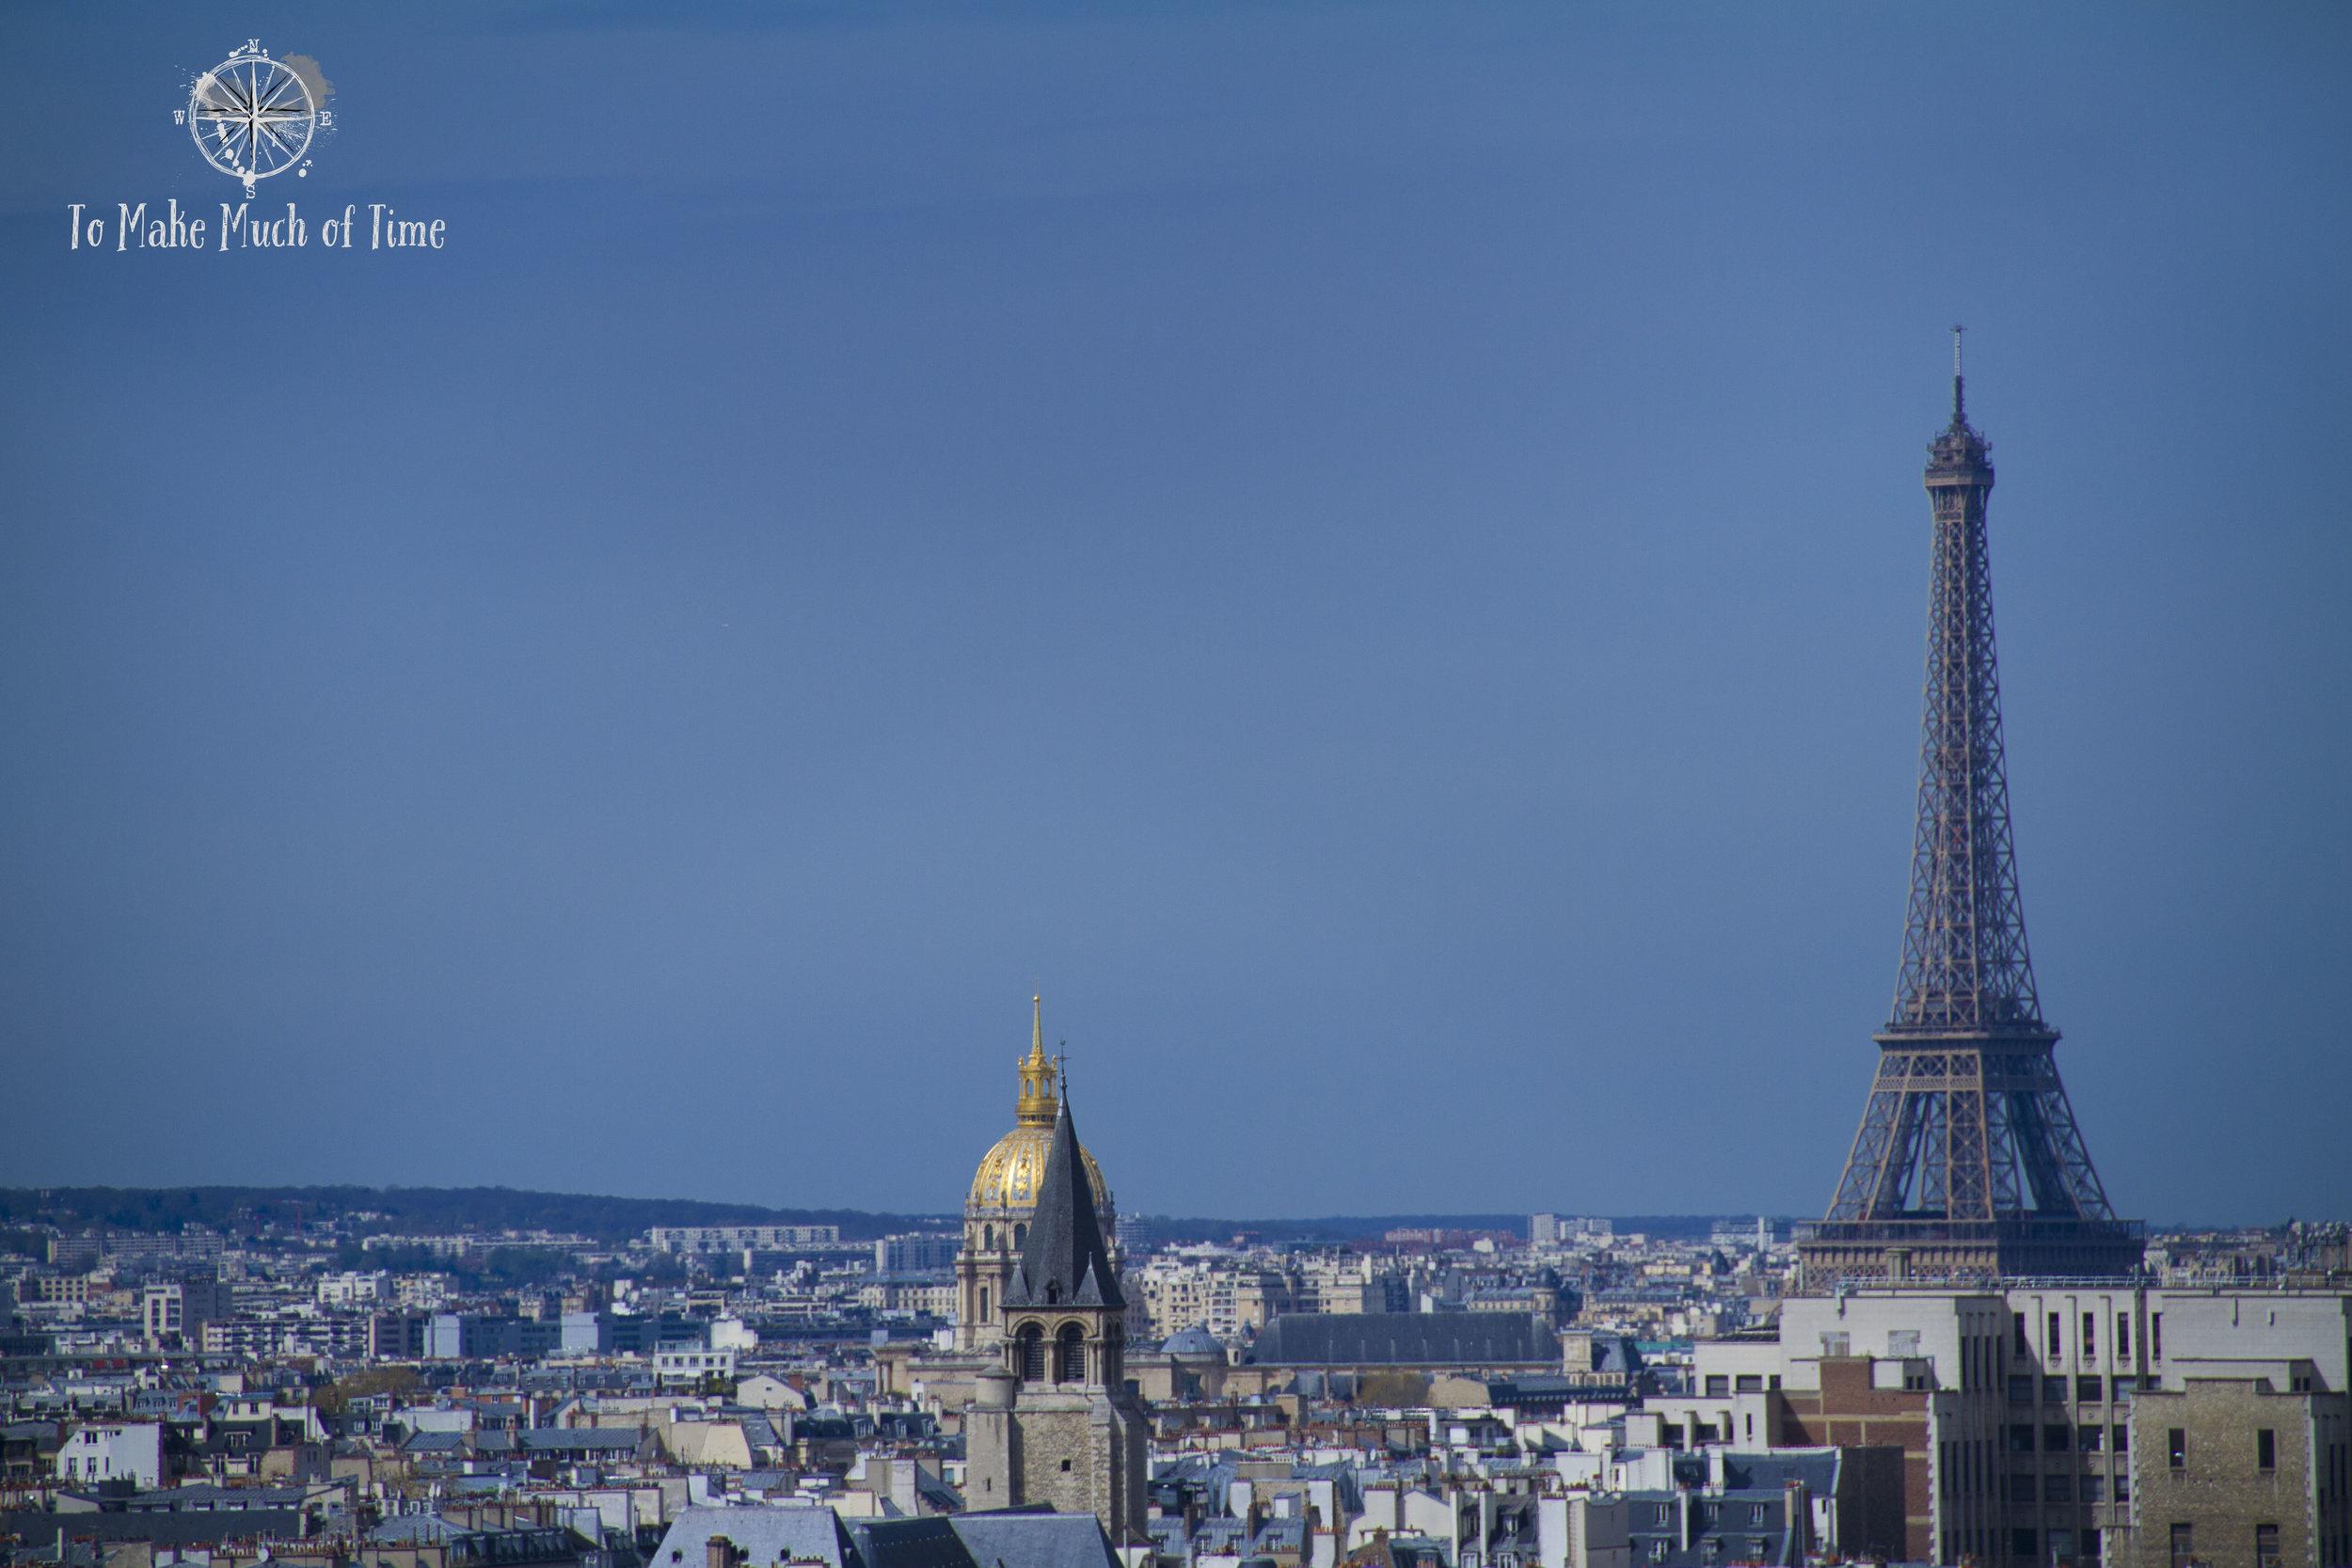 The Eiffel Tower is far away but seems closer through the zoom lens.